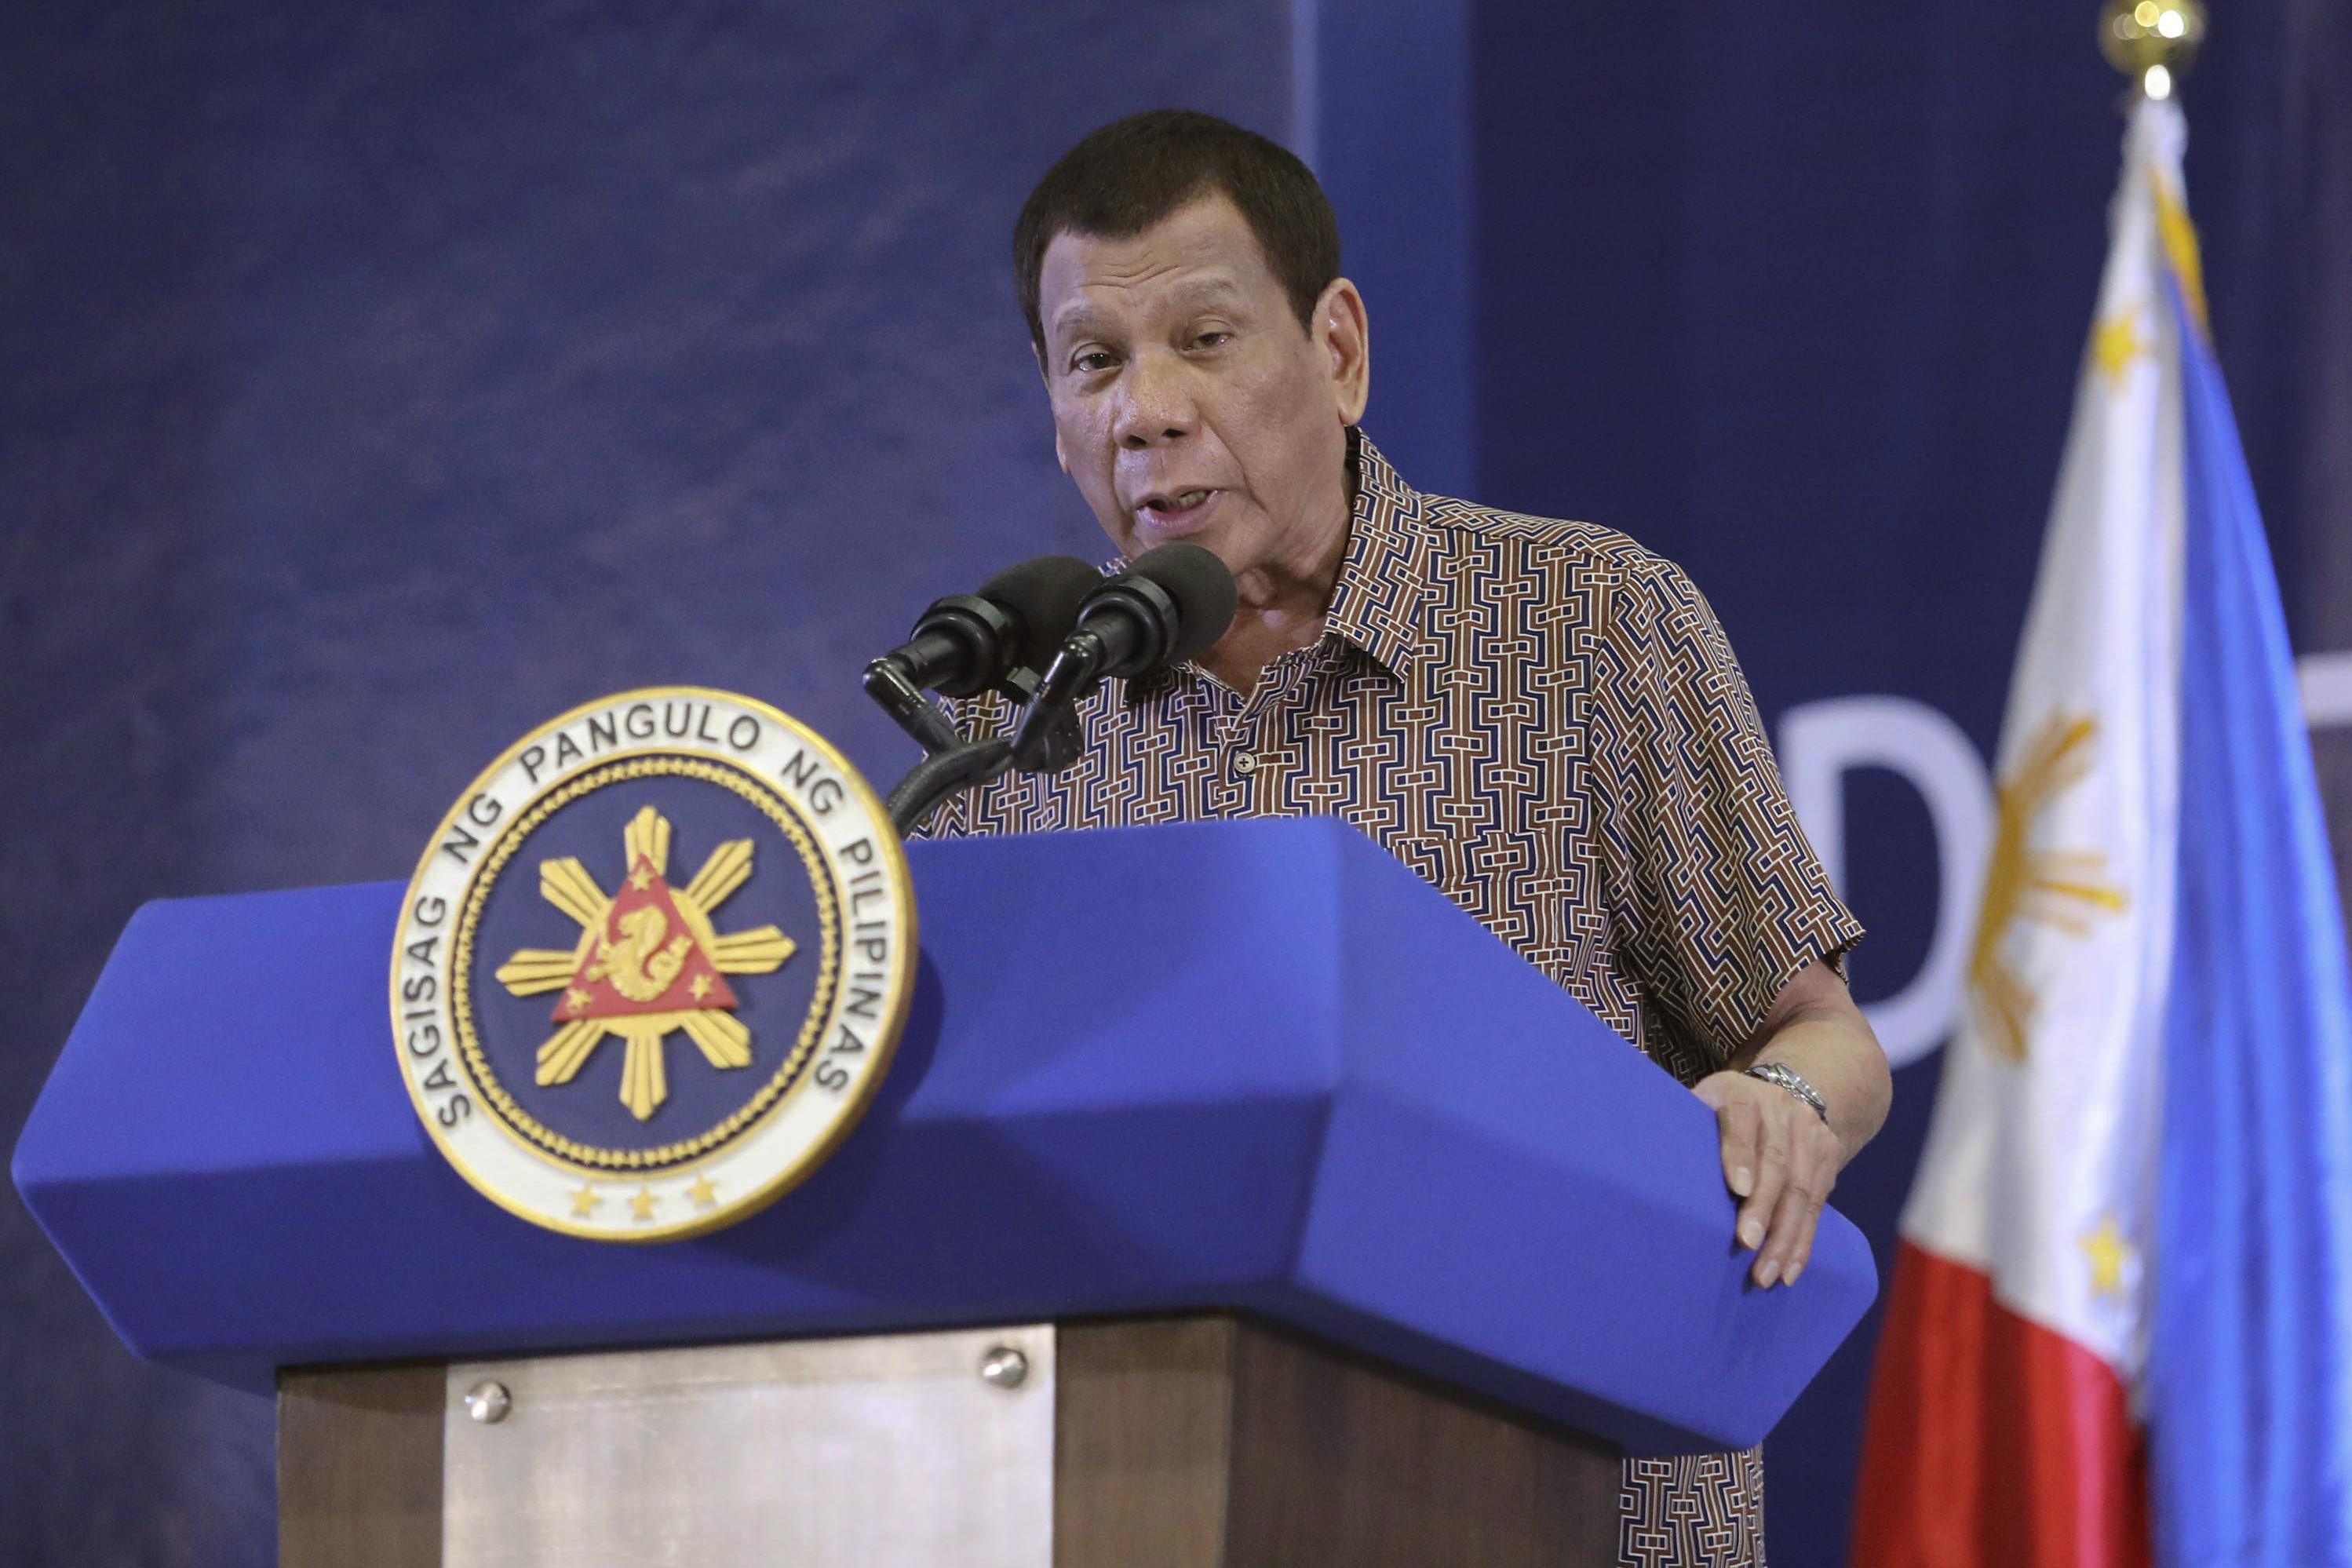 Philippines' Duterte Threatens to End U.S. Military Pact Over Senator's Entry Visa